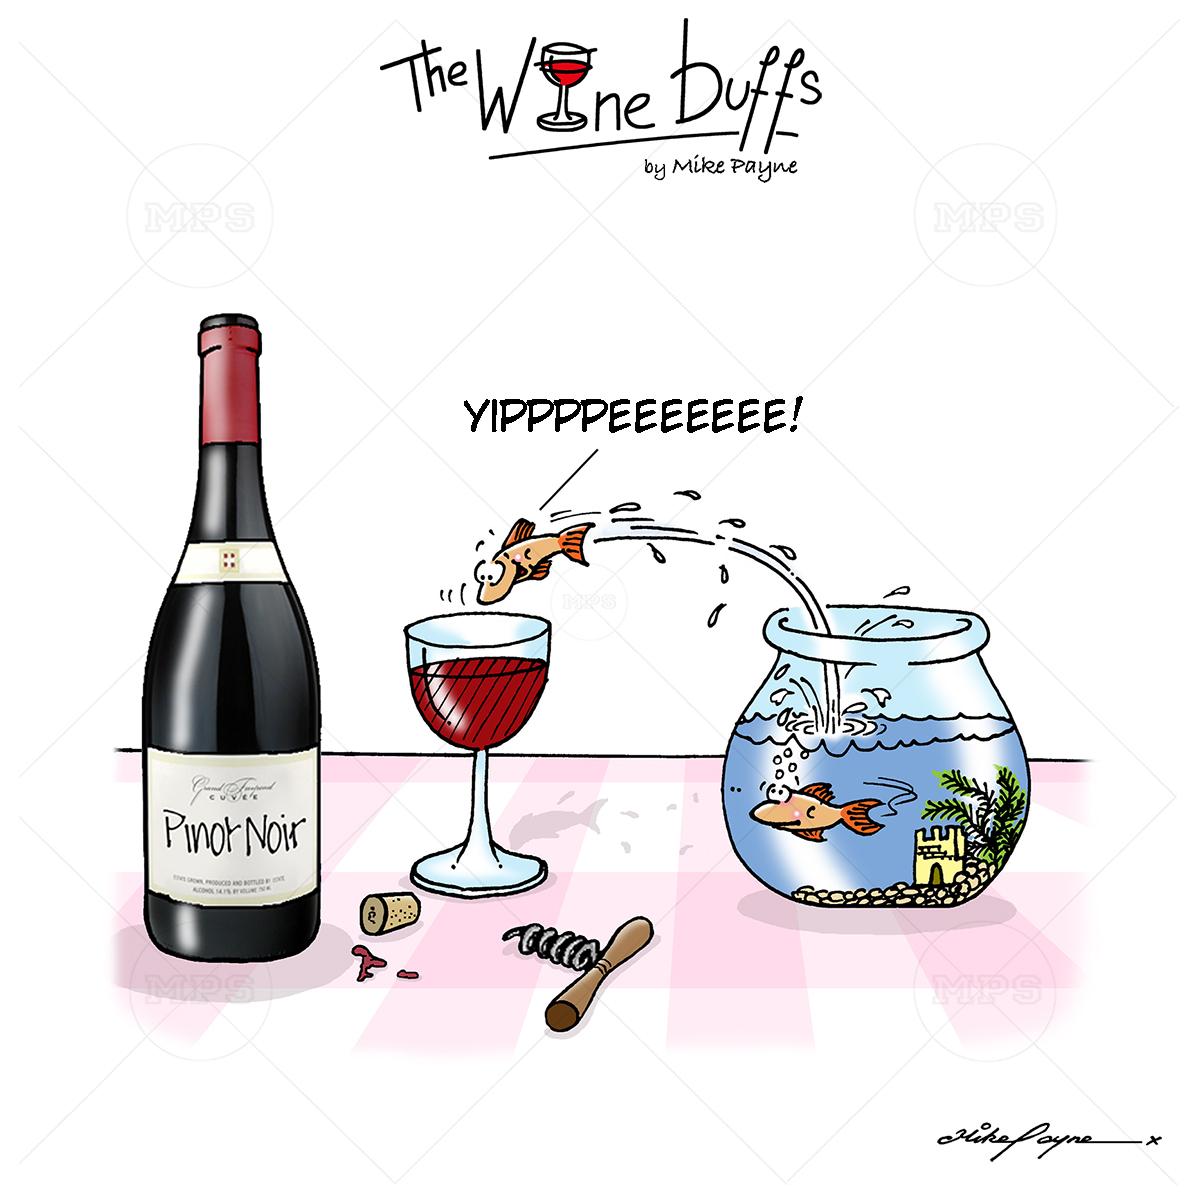 Wine Buffs Cartoon 009